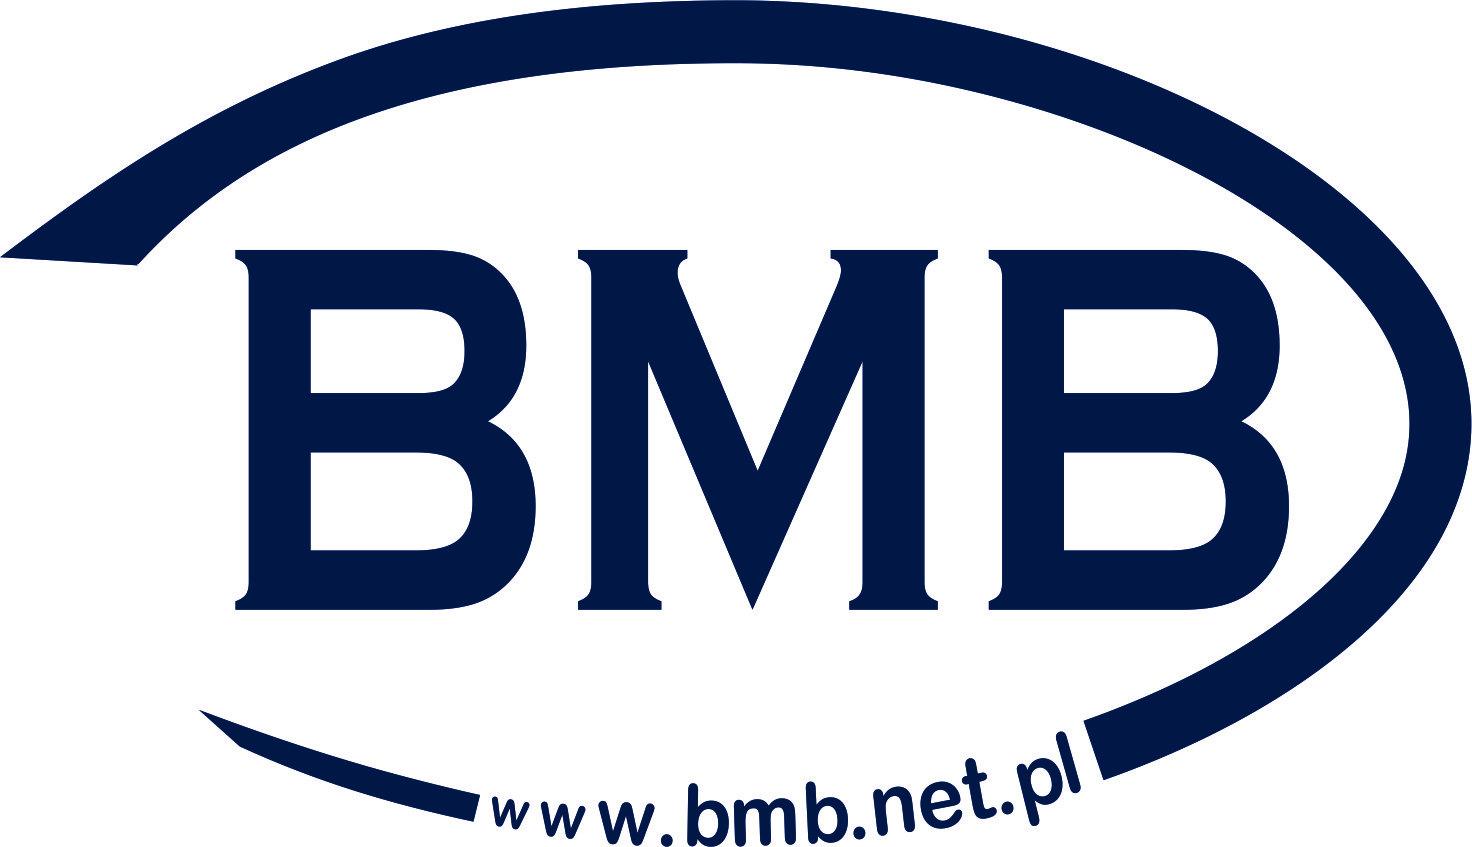 BMB Sp.z o.o.